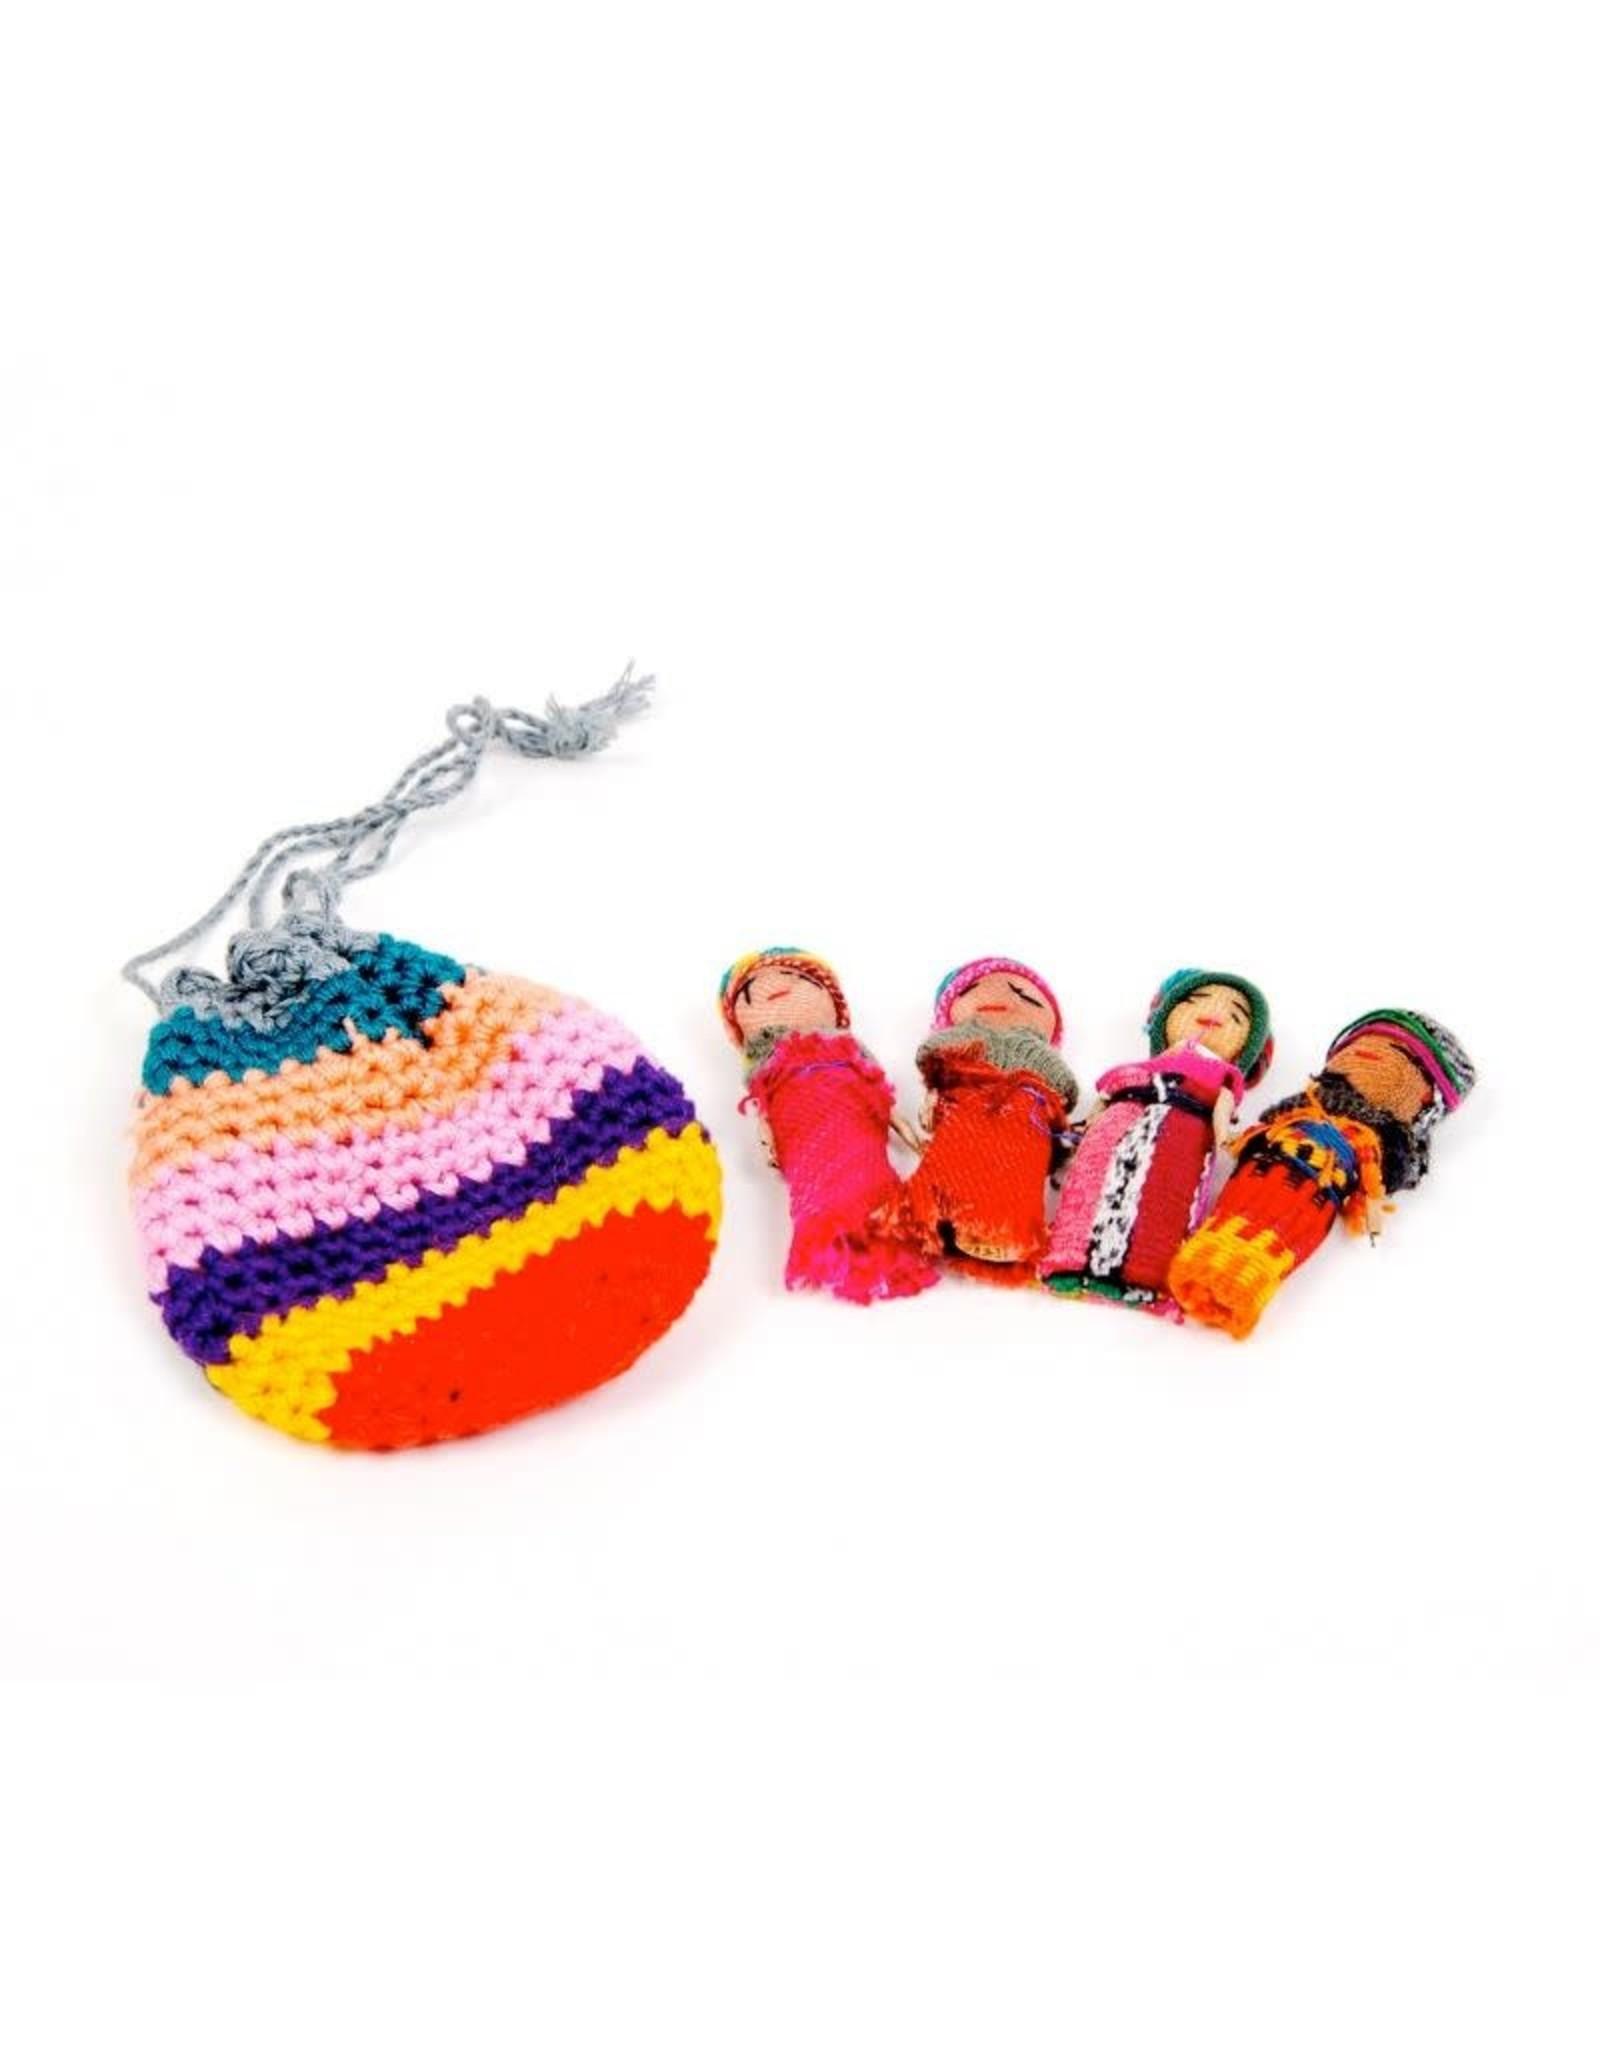 Lumily Guatemalan Worry Dolls